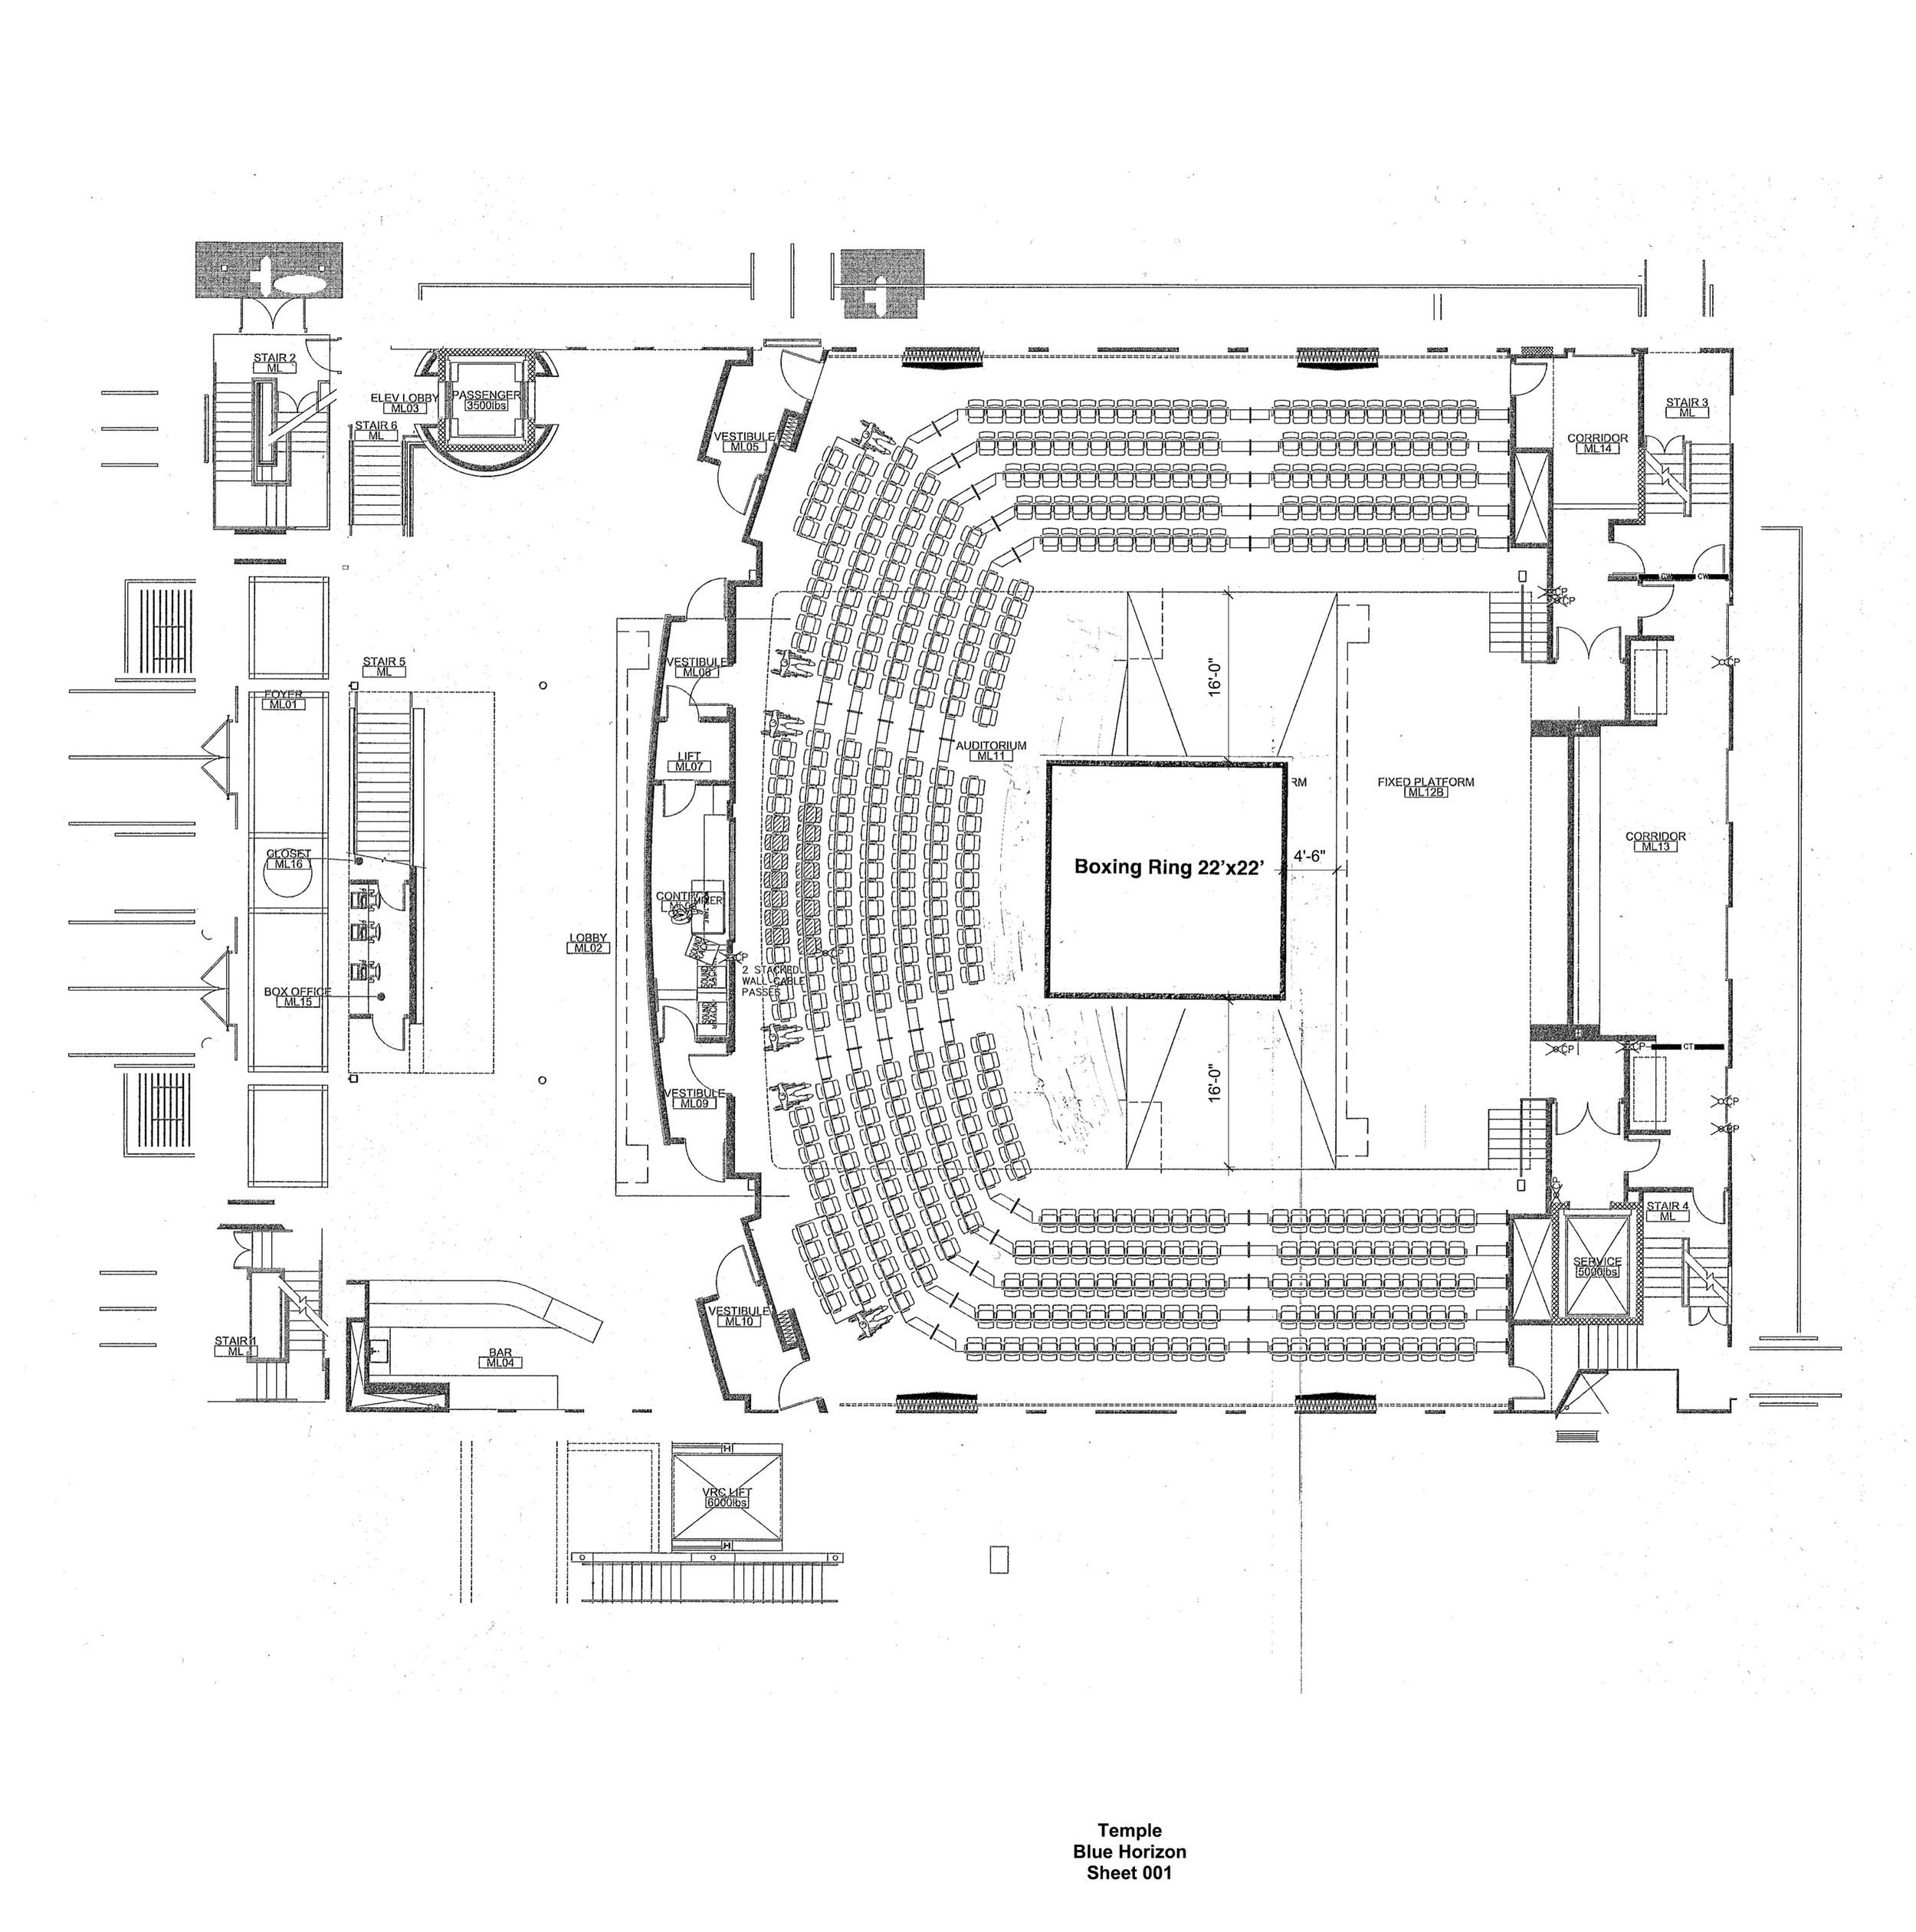 Boxing Ring Floor Plan